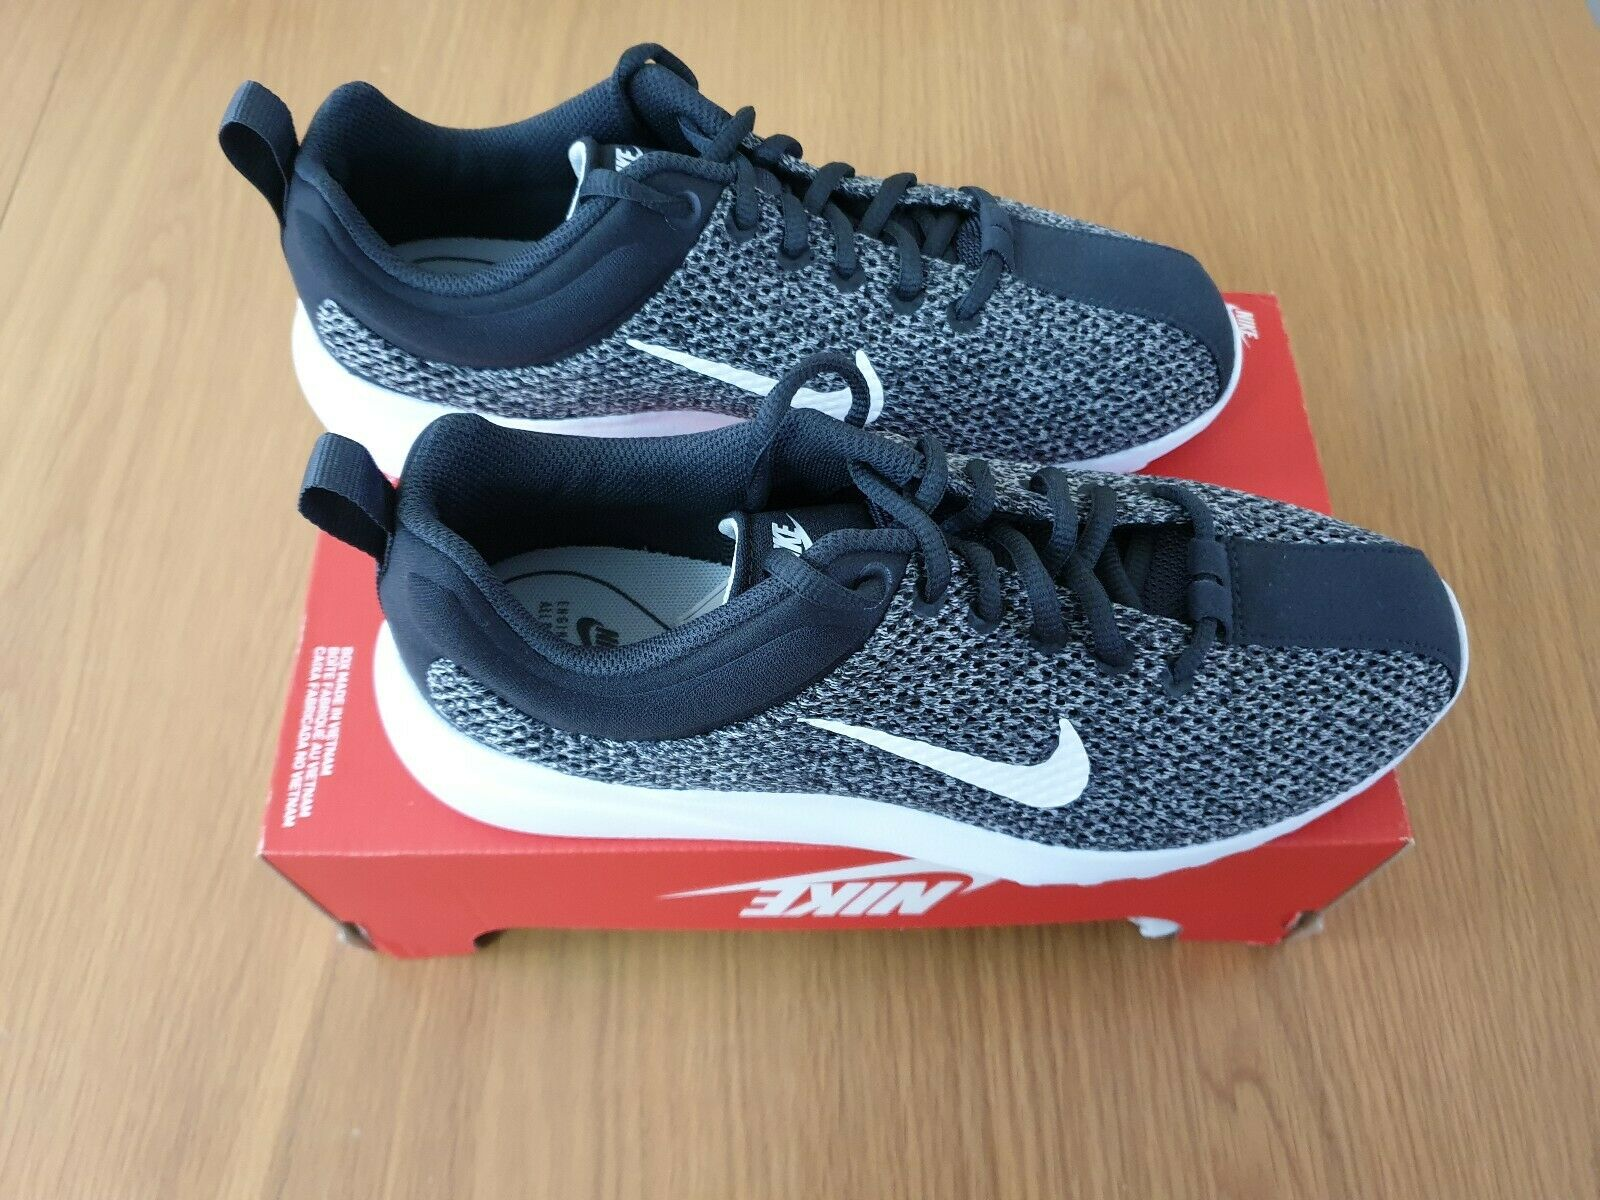 Womems Nike Superflyte Size 5.5UK